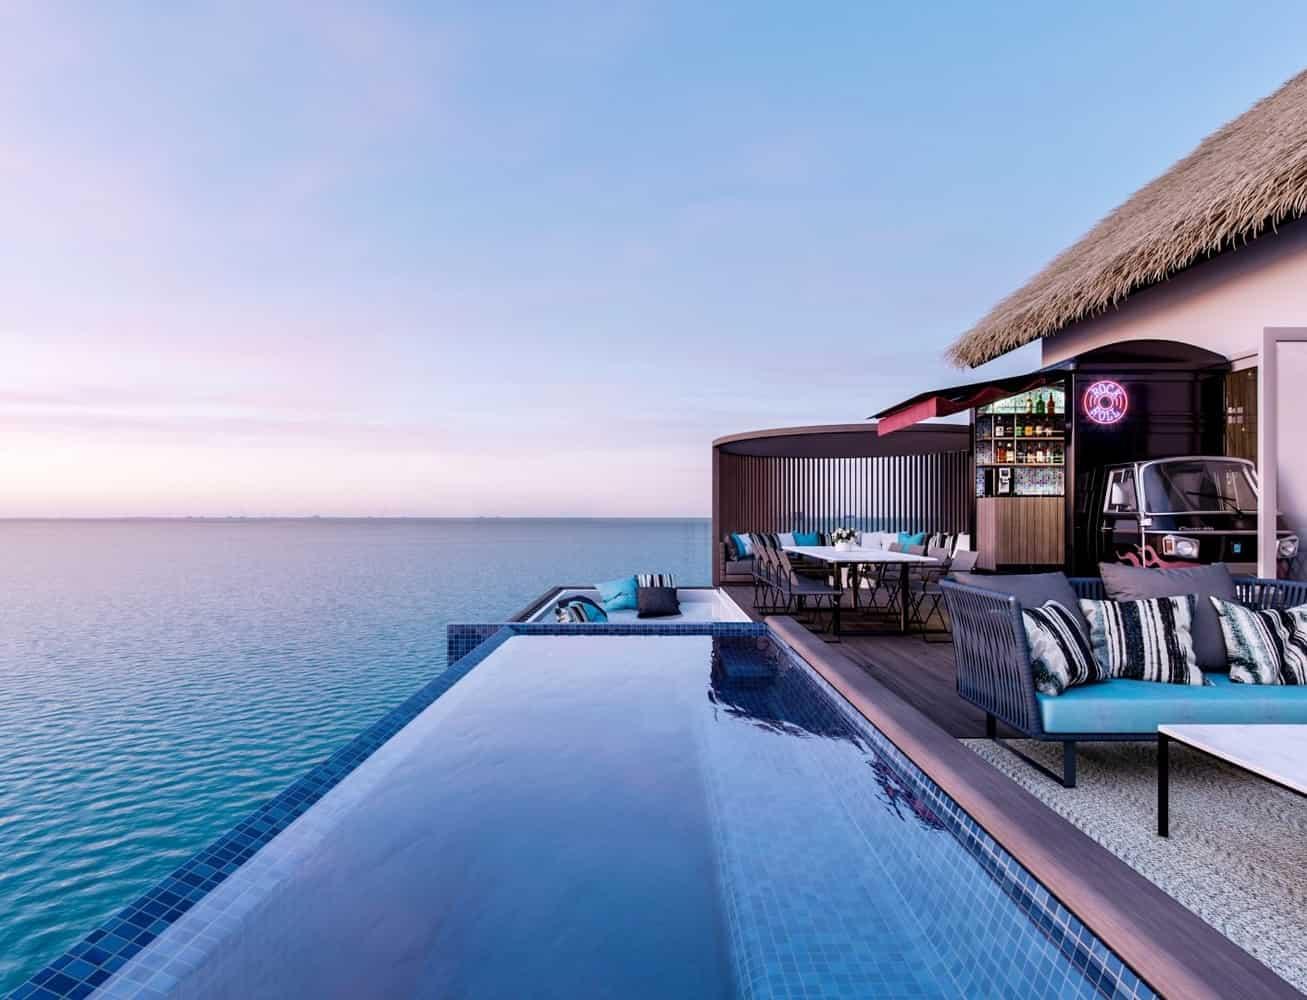 Pertama Kalinya, Hard Rock Hotel Maldives Dibuka